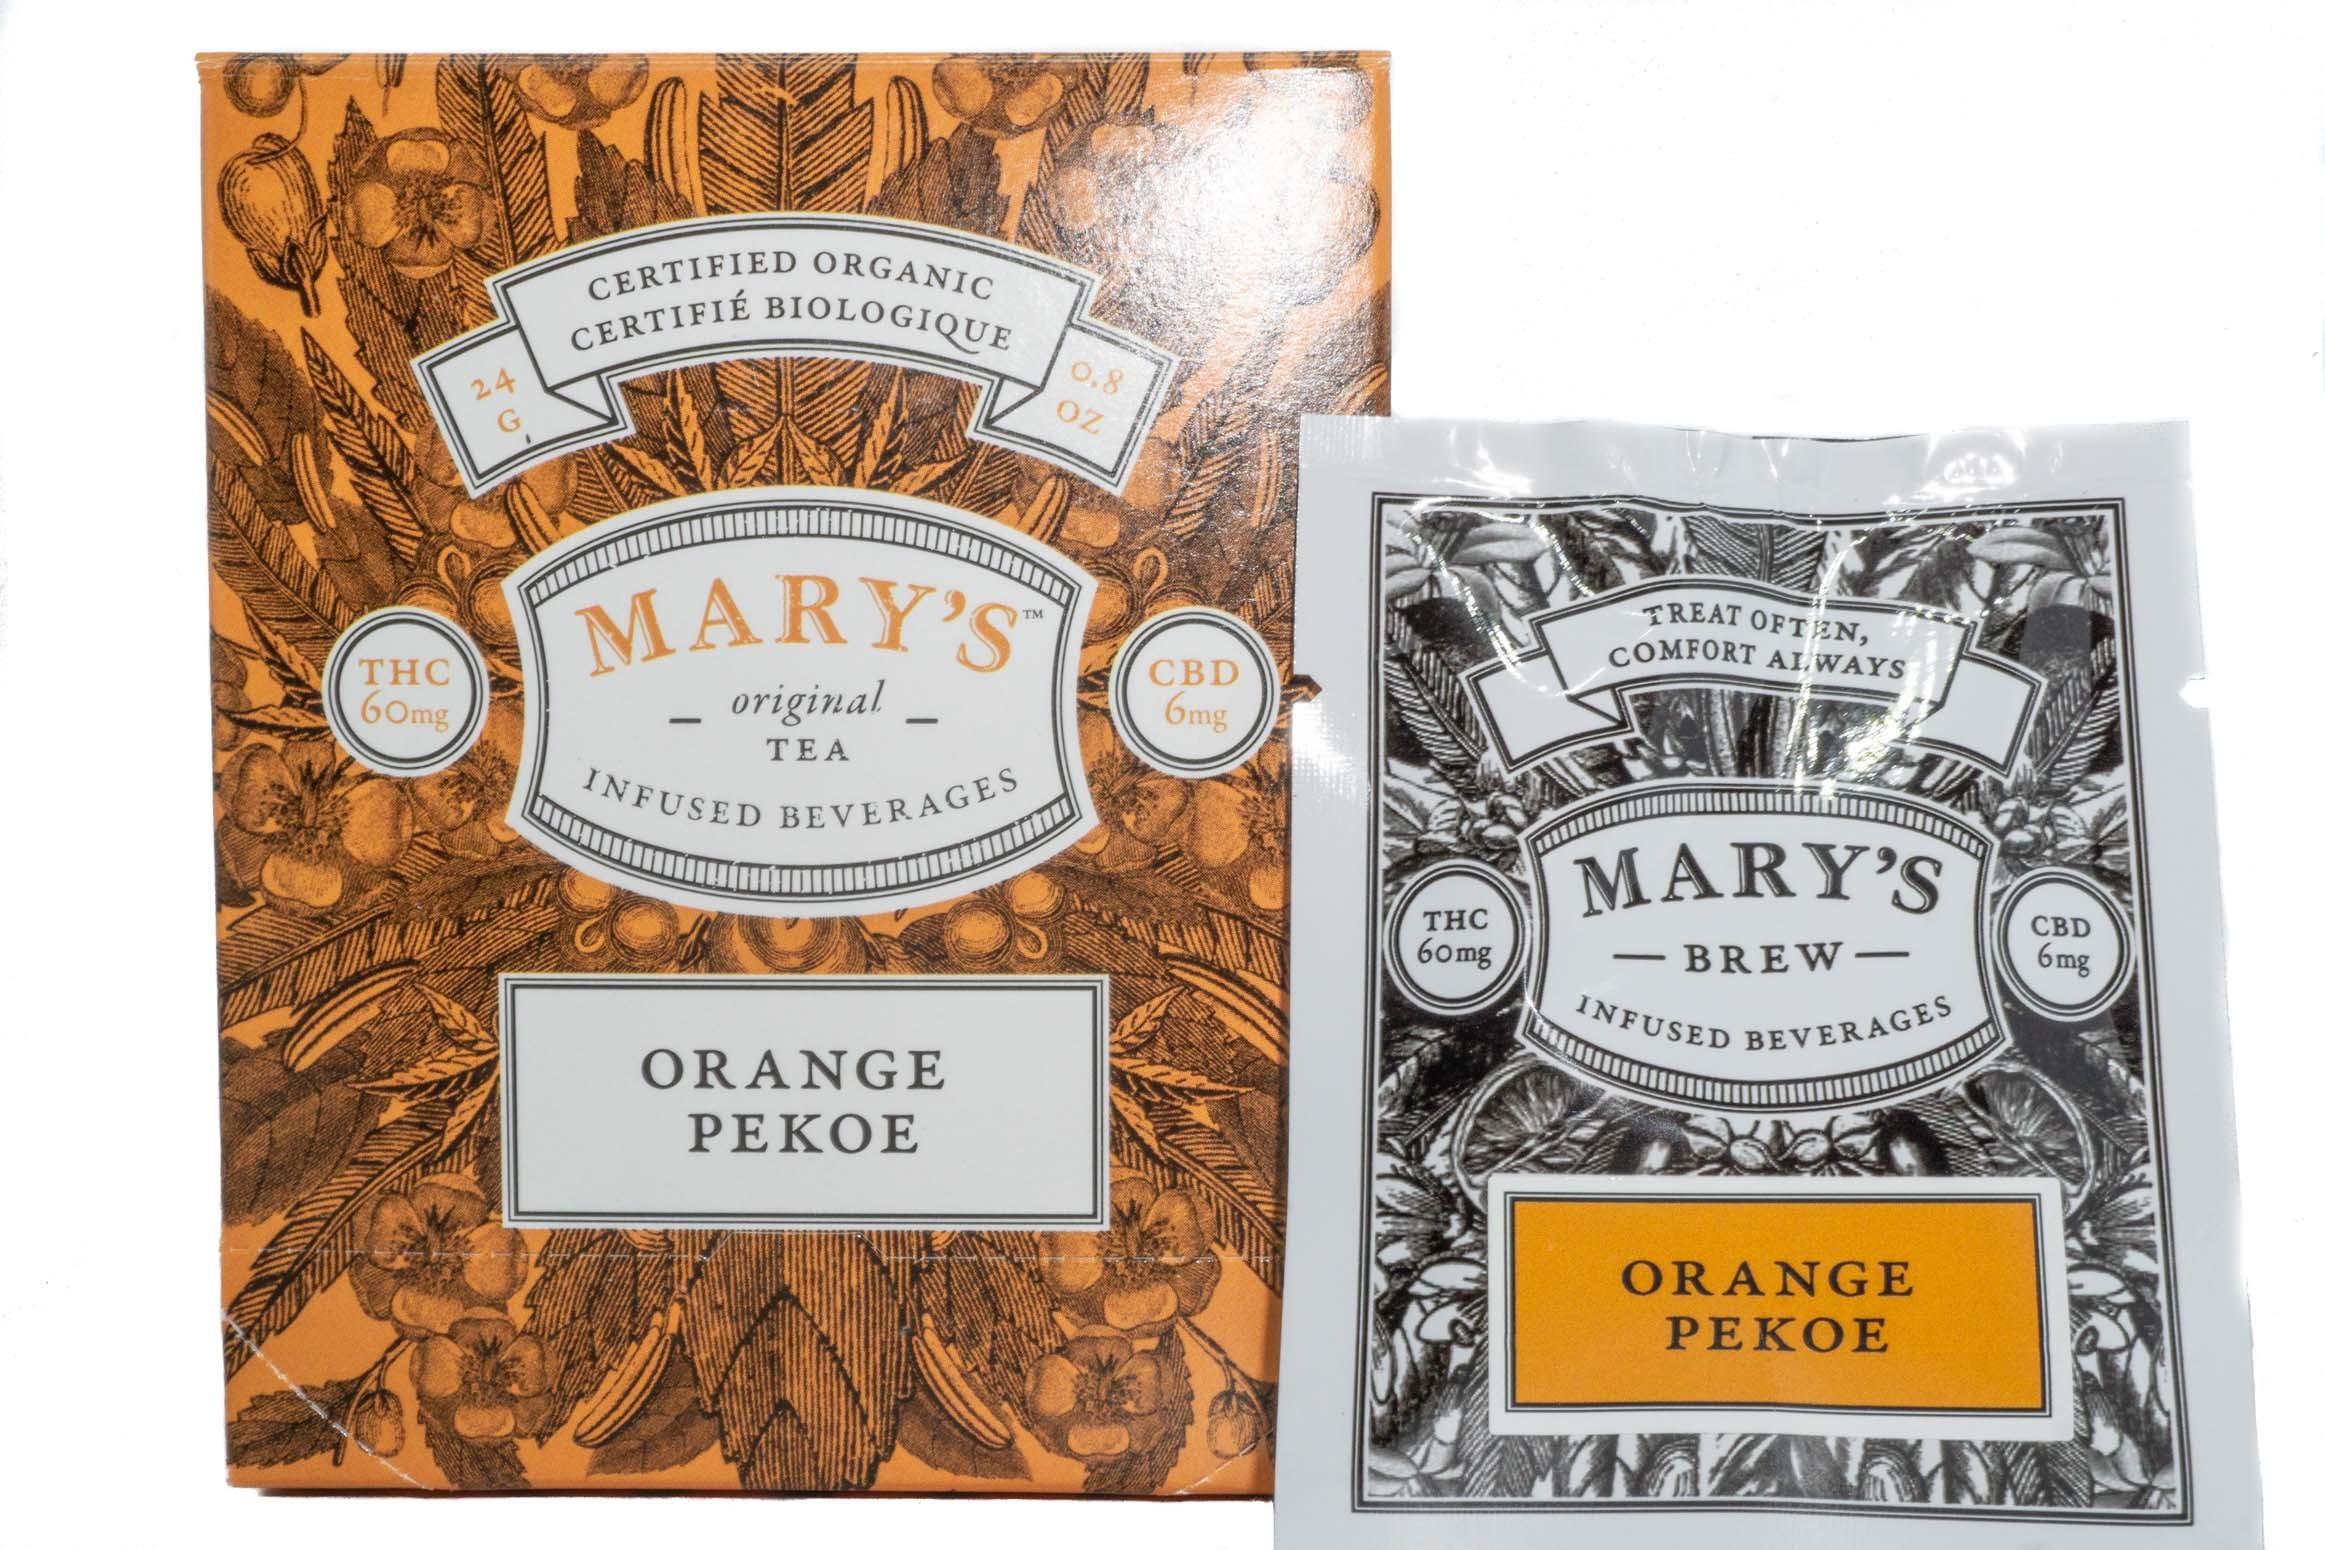 Mary's Wellness Orange Pekoe Tea (Single Sachet) (60mg THC/6mg CBD) 01237